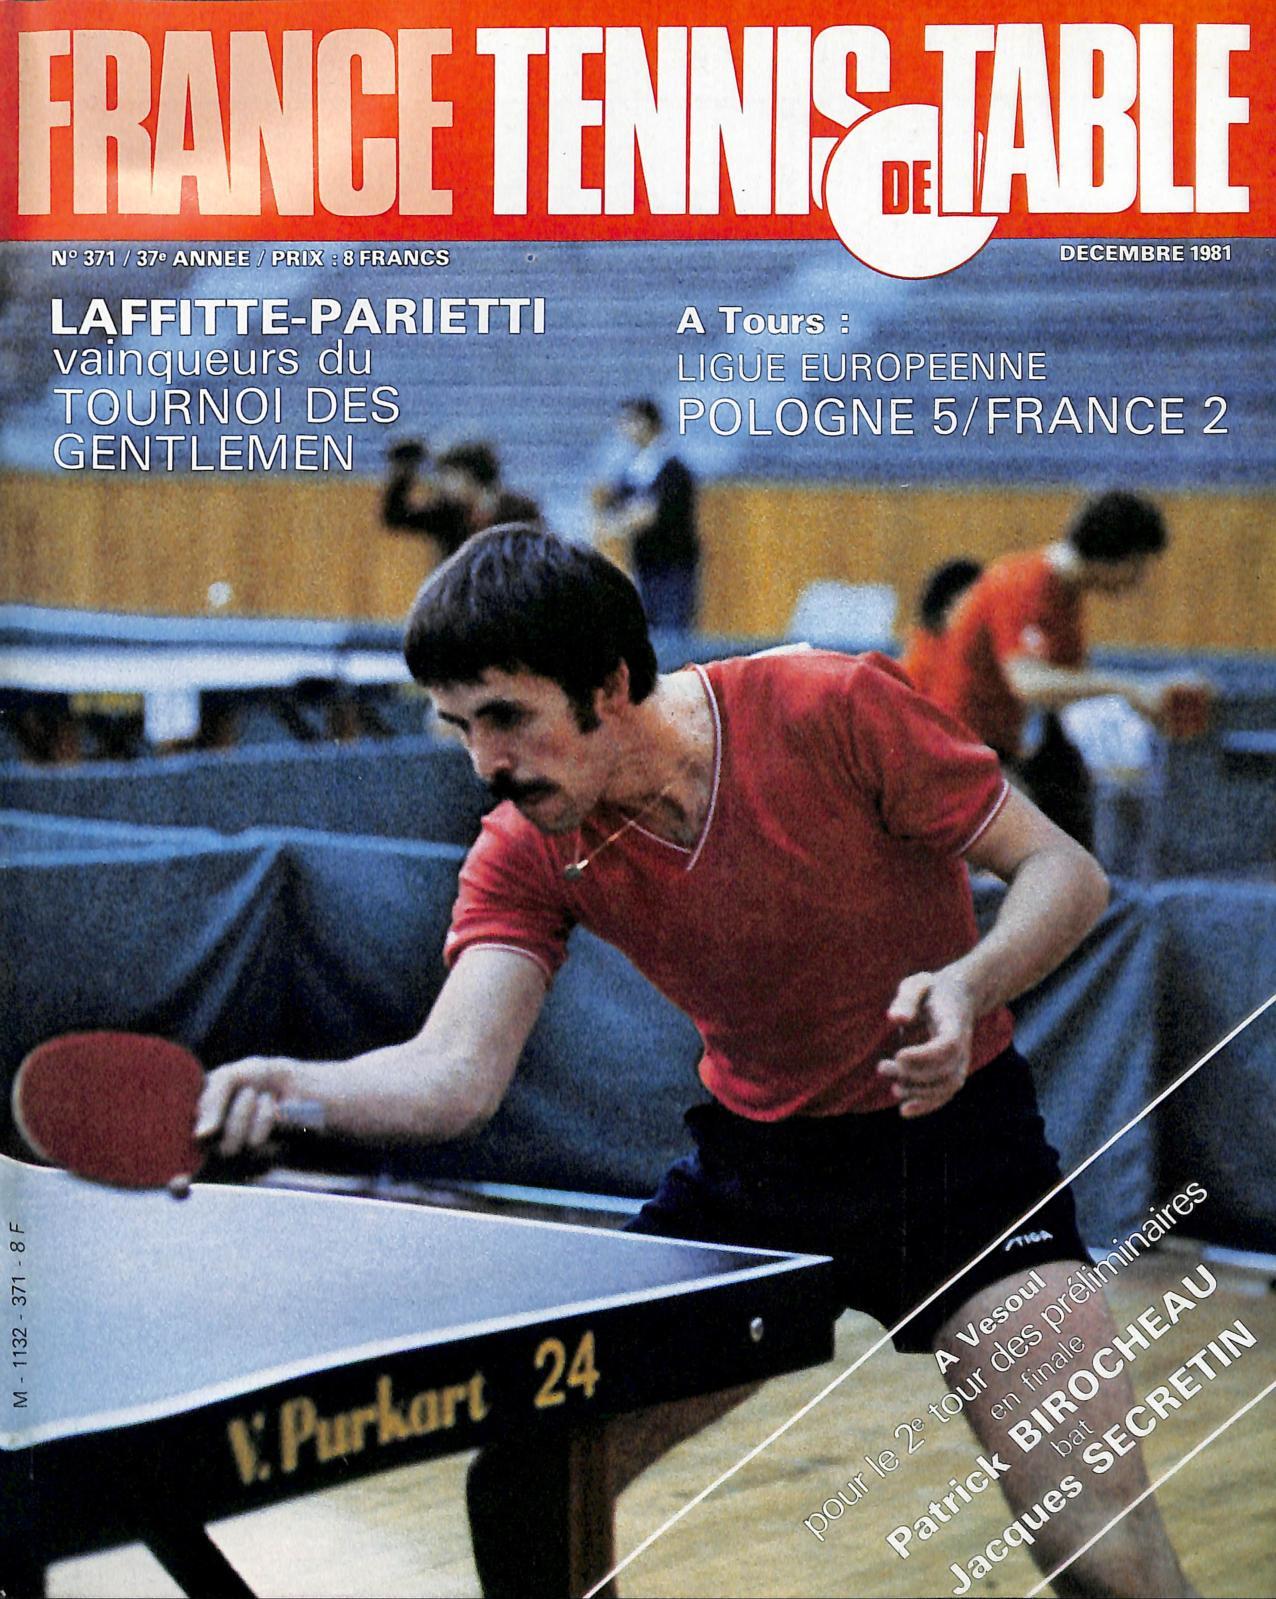 12 France 1981 371 De Table Tennis Calaméo nX8OkwPN0